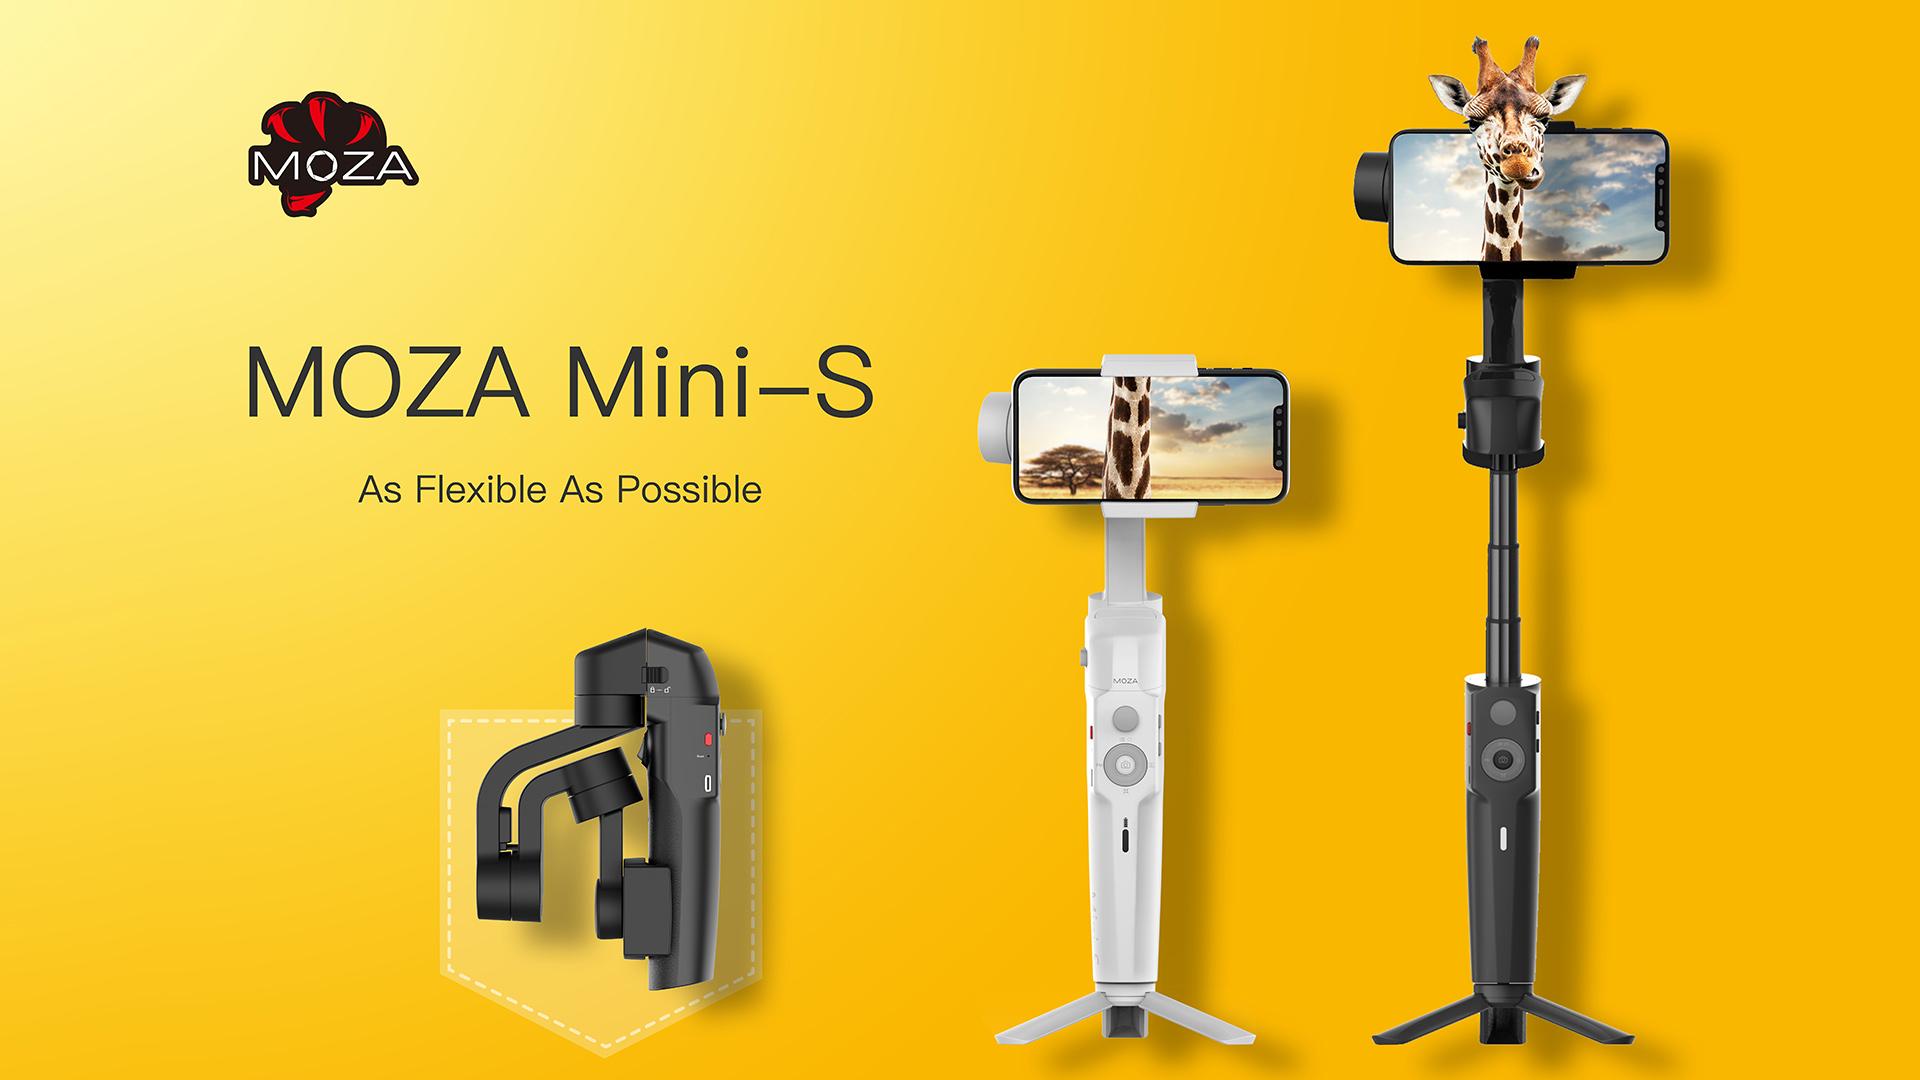 Smartphone Gimbal MOZA Mini-S revelaed at CES 2019 | cinema5D